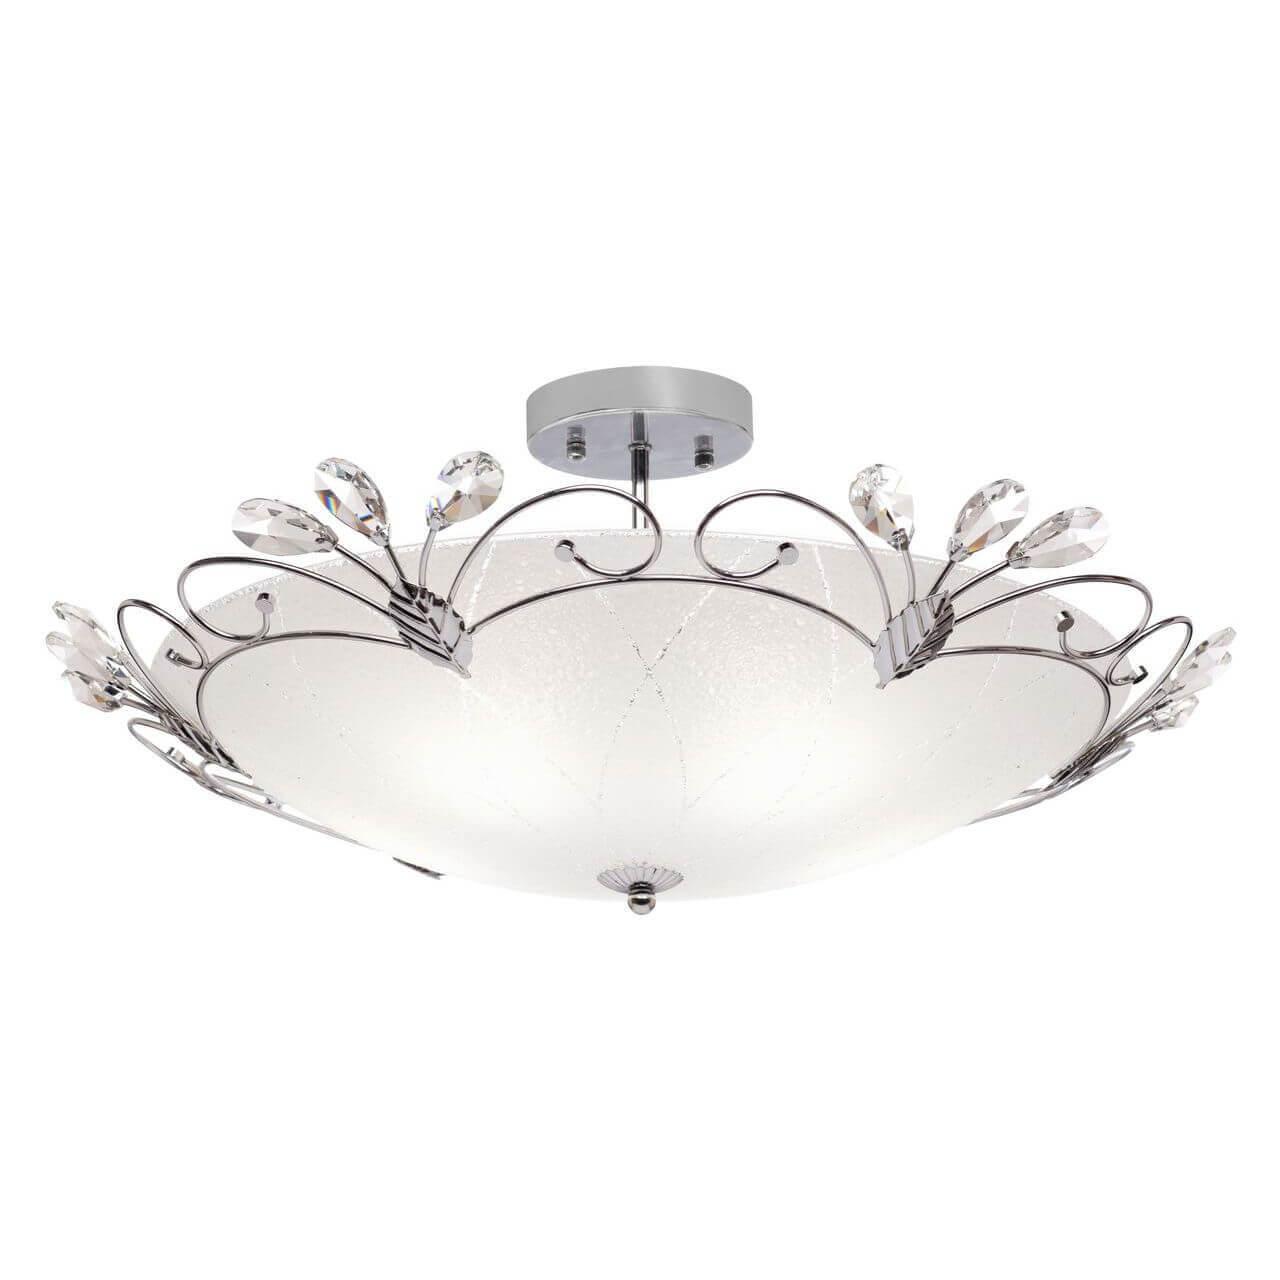 Светильник Silver Light 838.54.5 Lotos Chrome